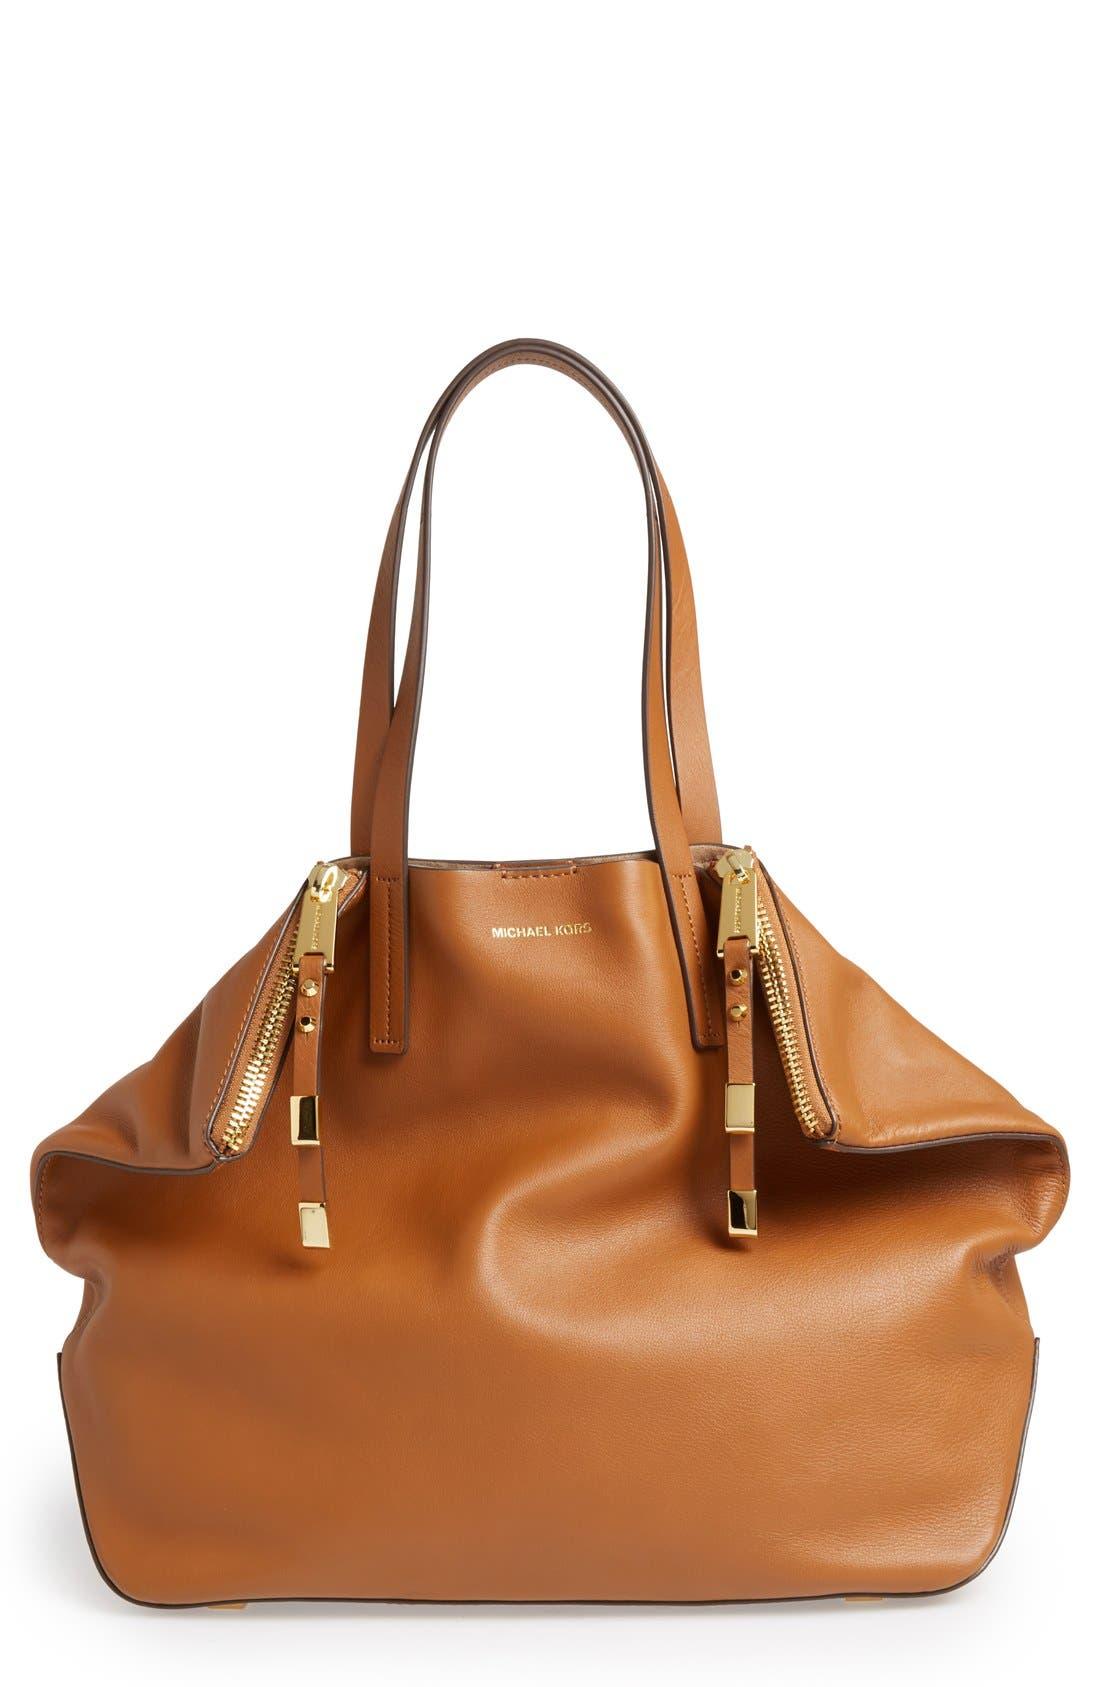 Alternate Image 1 Selected - Michael Kors 'Large Miranda' Leather Shopper